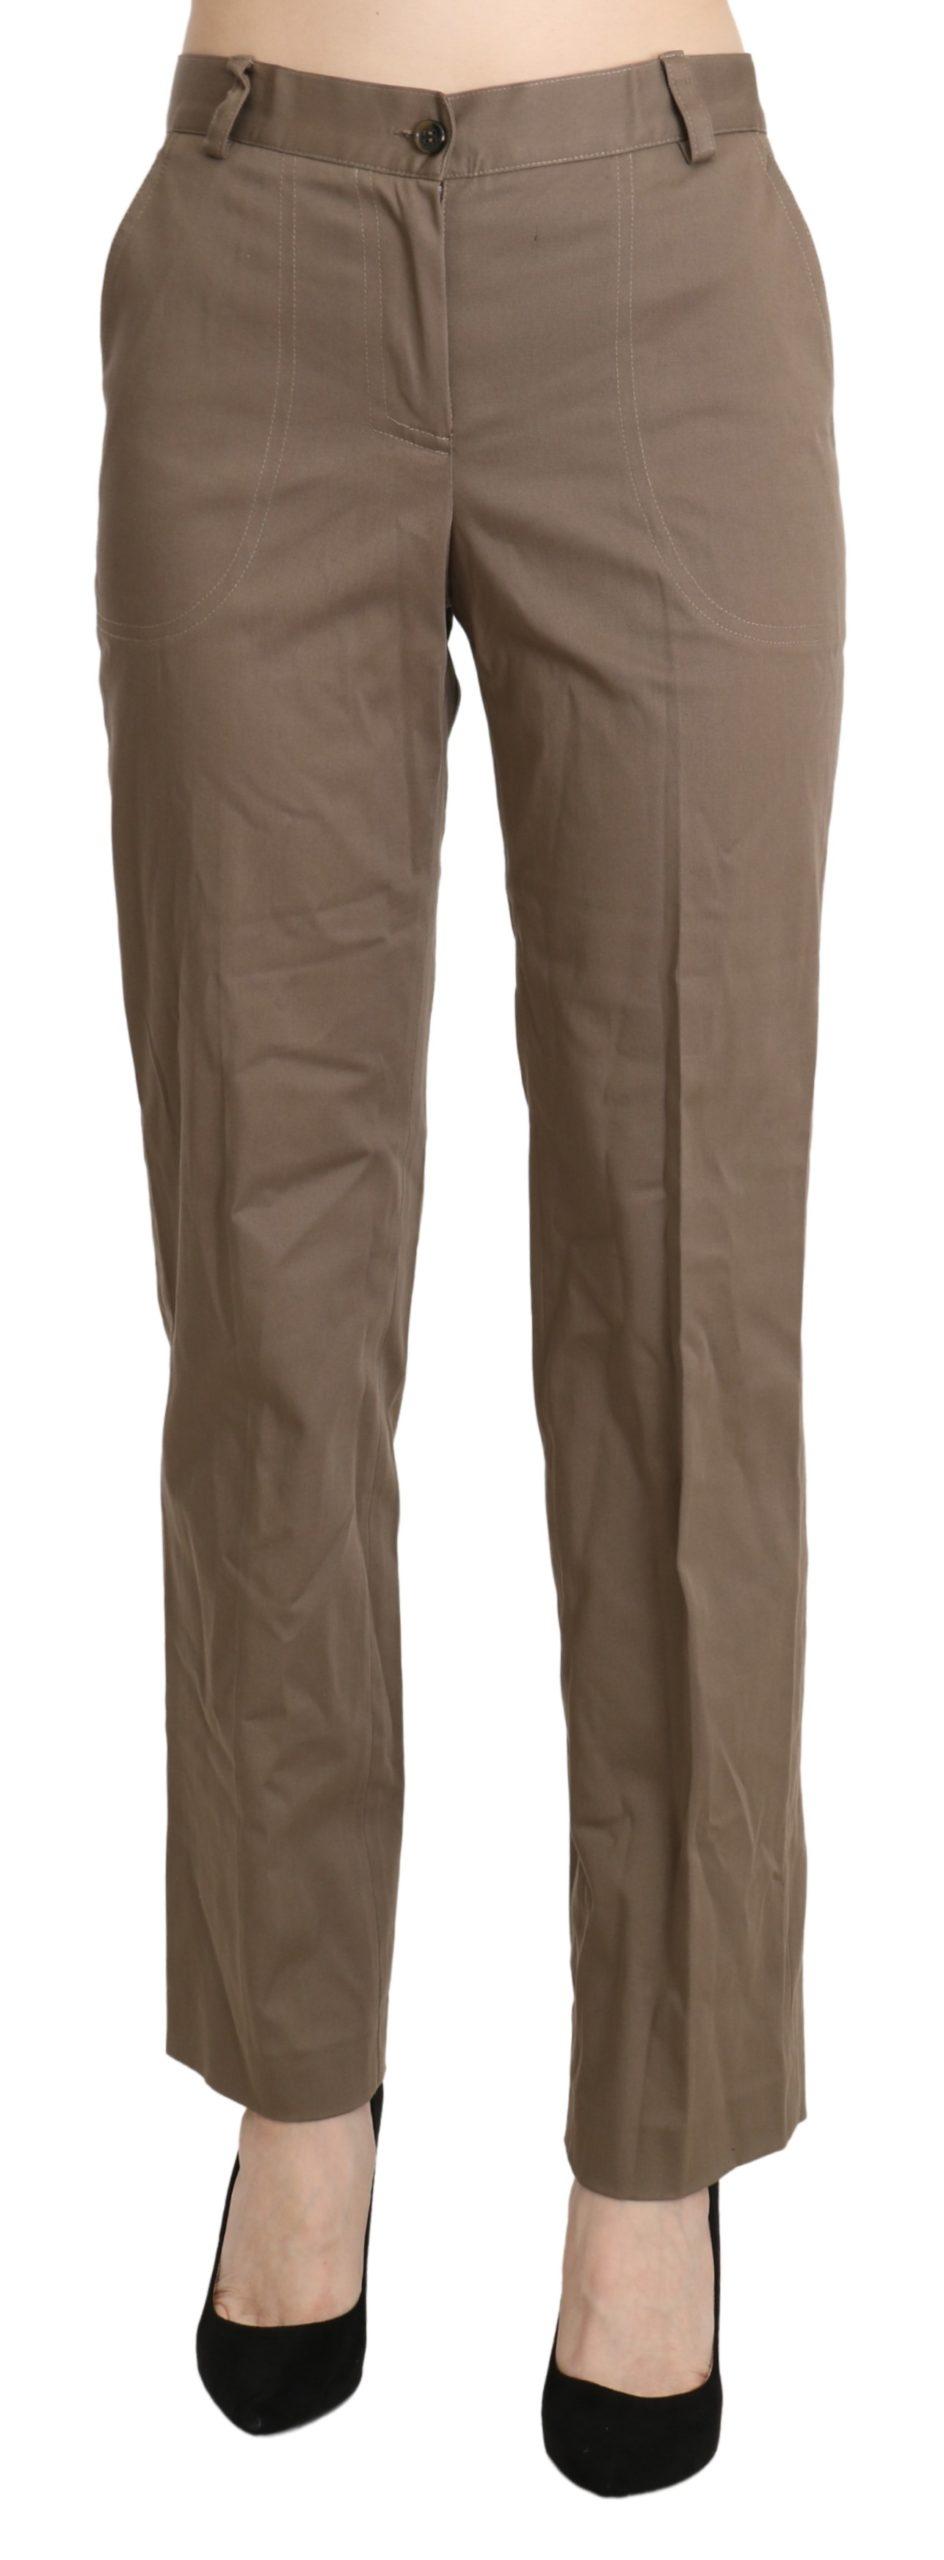 BENCIVENGA Women's High Waist Straight Trouser Brown PAN71342-42 - IT42 M